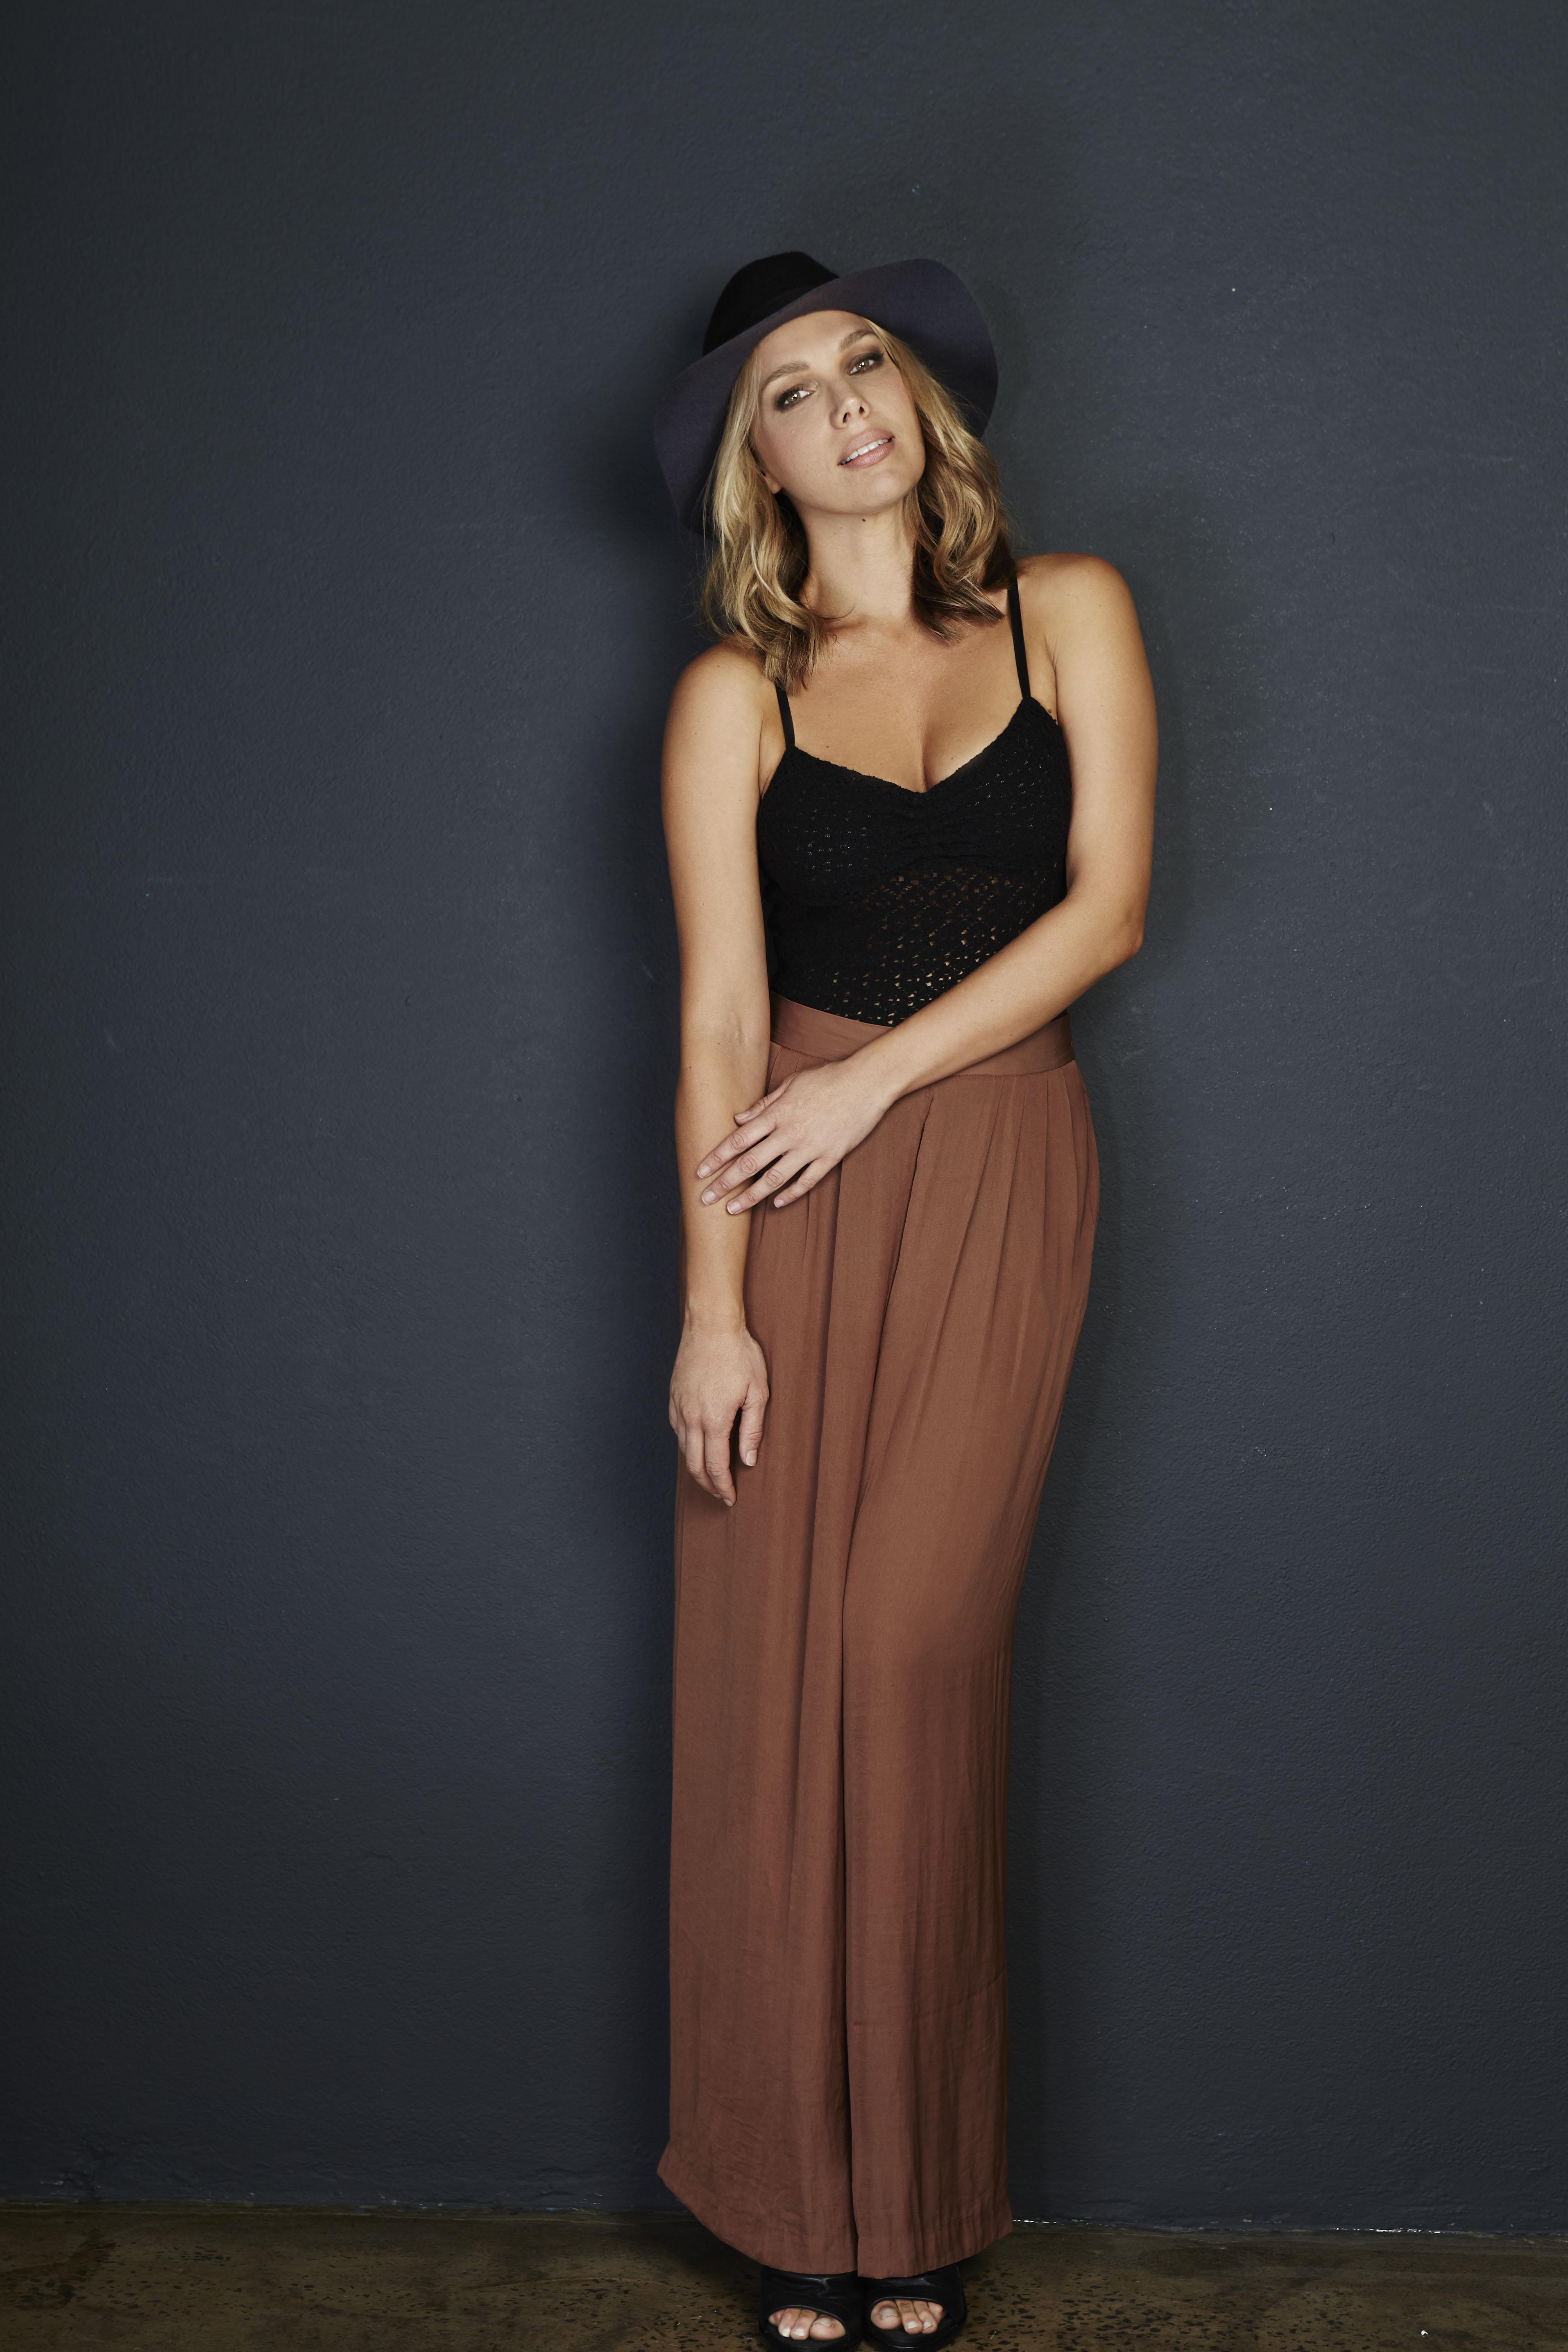 Michelle Silhouette Models